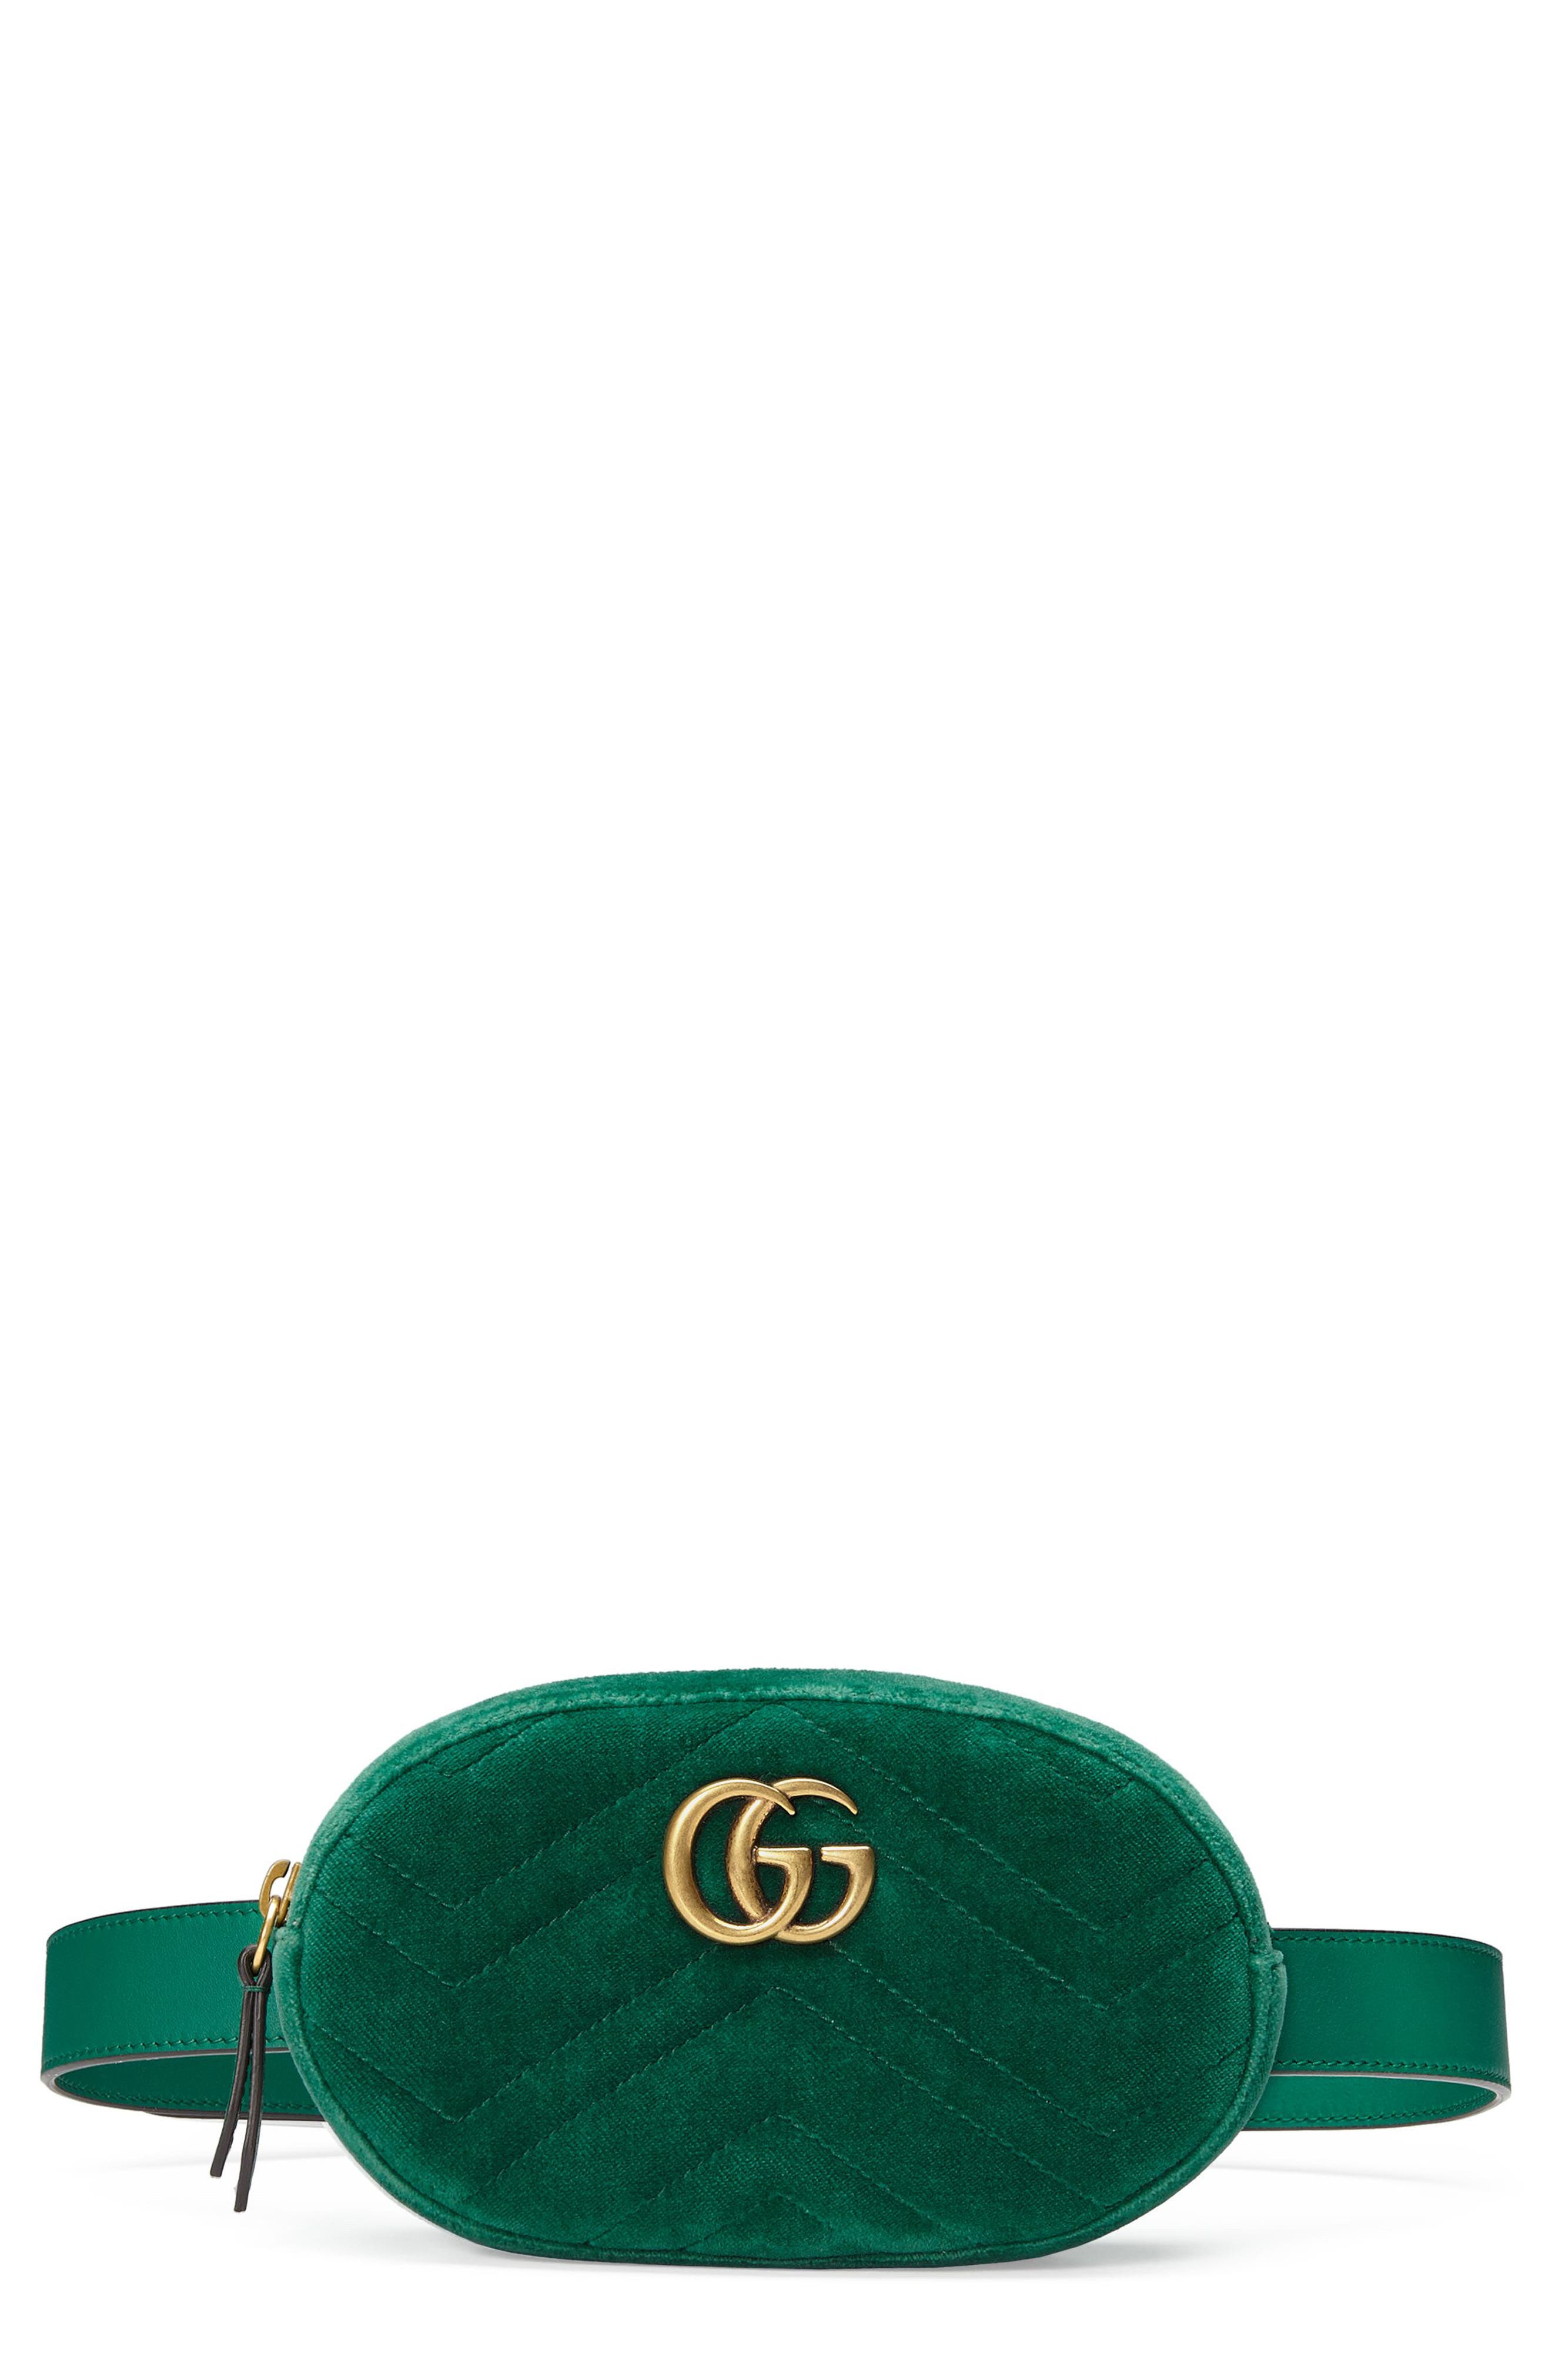 Small GG Marmont 2.0 Velvet Belt Bag,                             Main thumbnail 1, color,                             EMERALD/ EMERALD